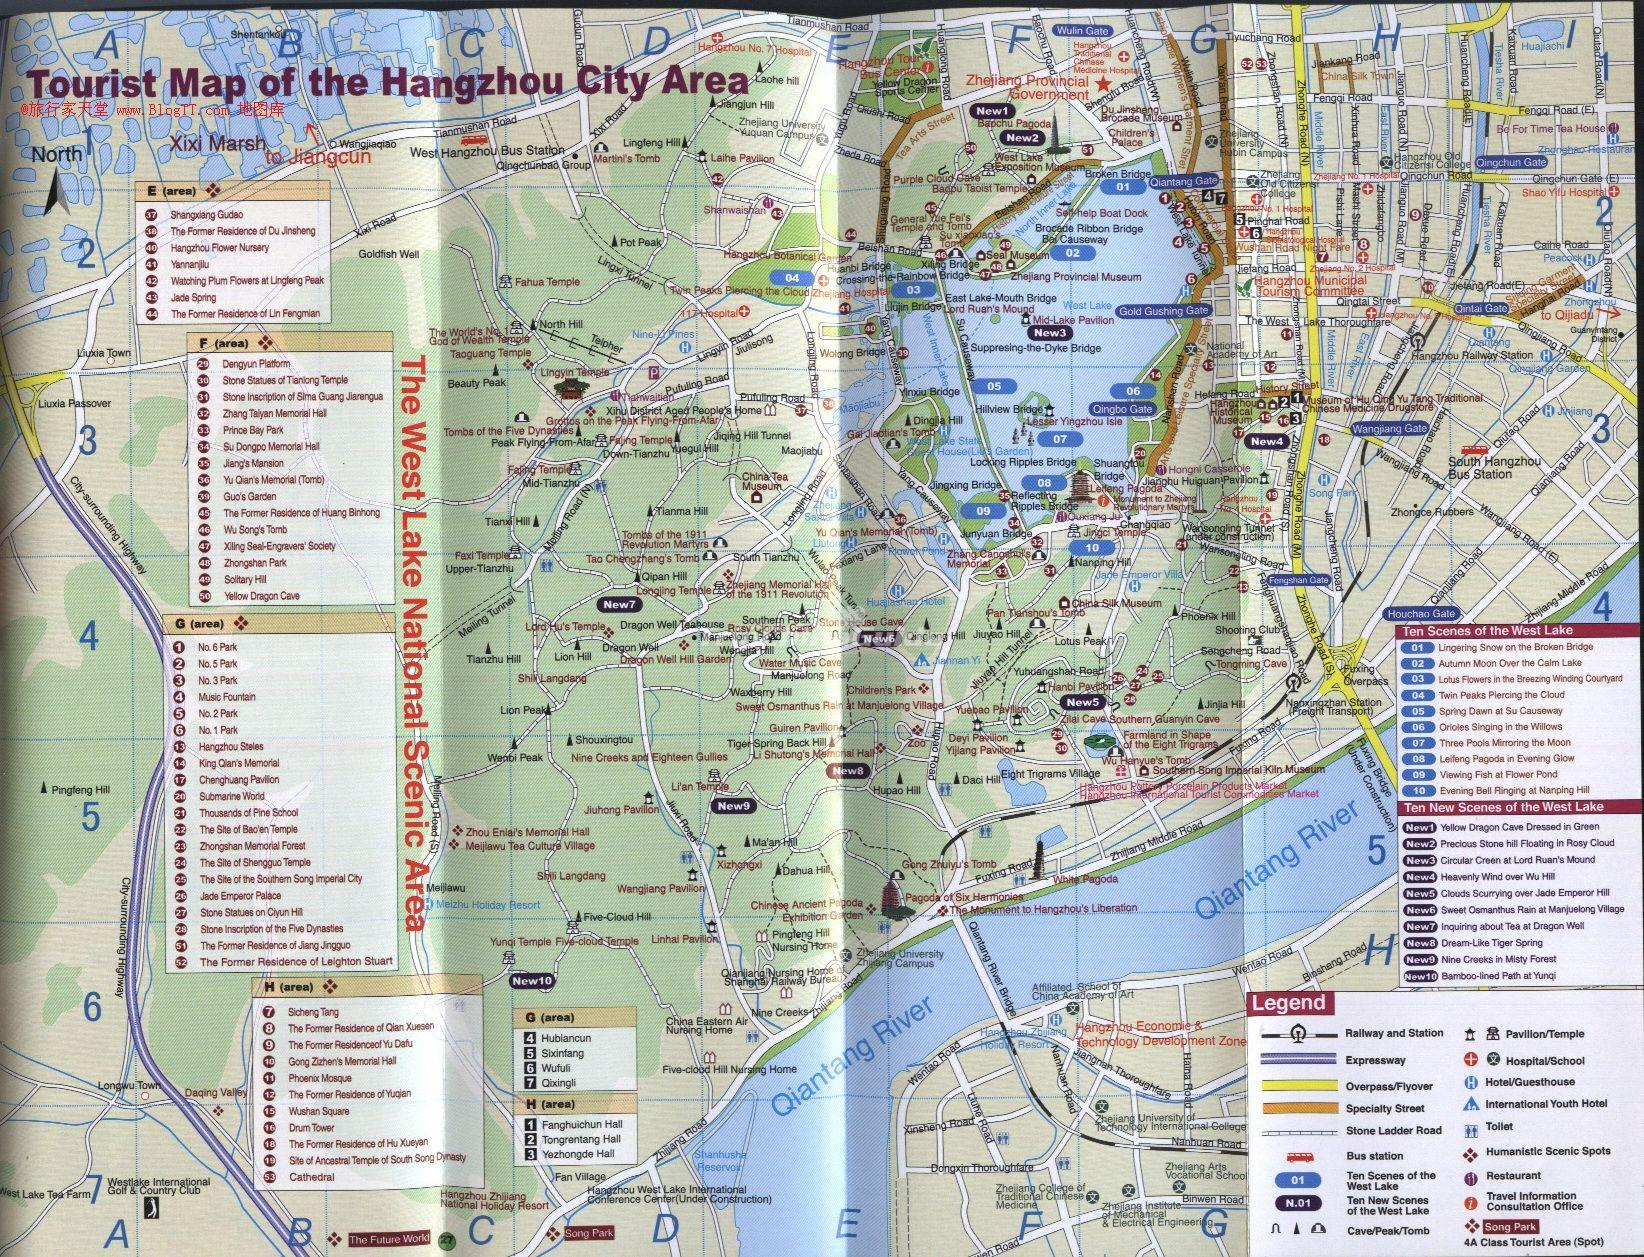 Tourist Map of the Hangzhou City Area Maps of Hangzhou